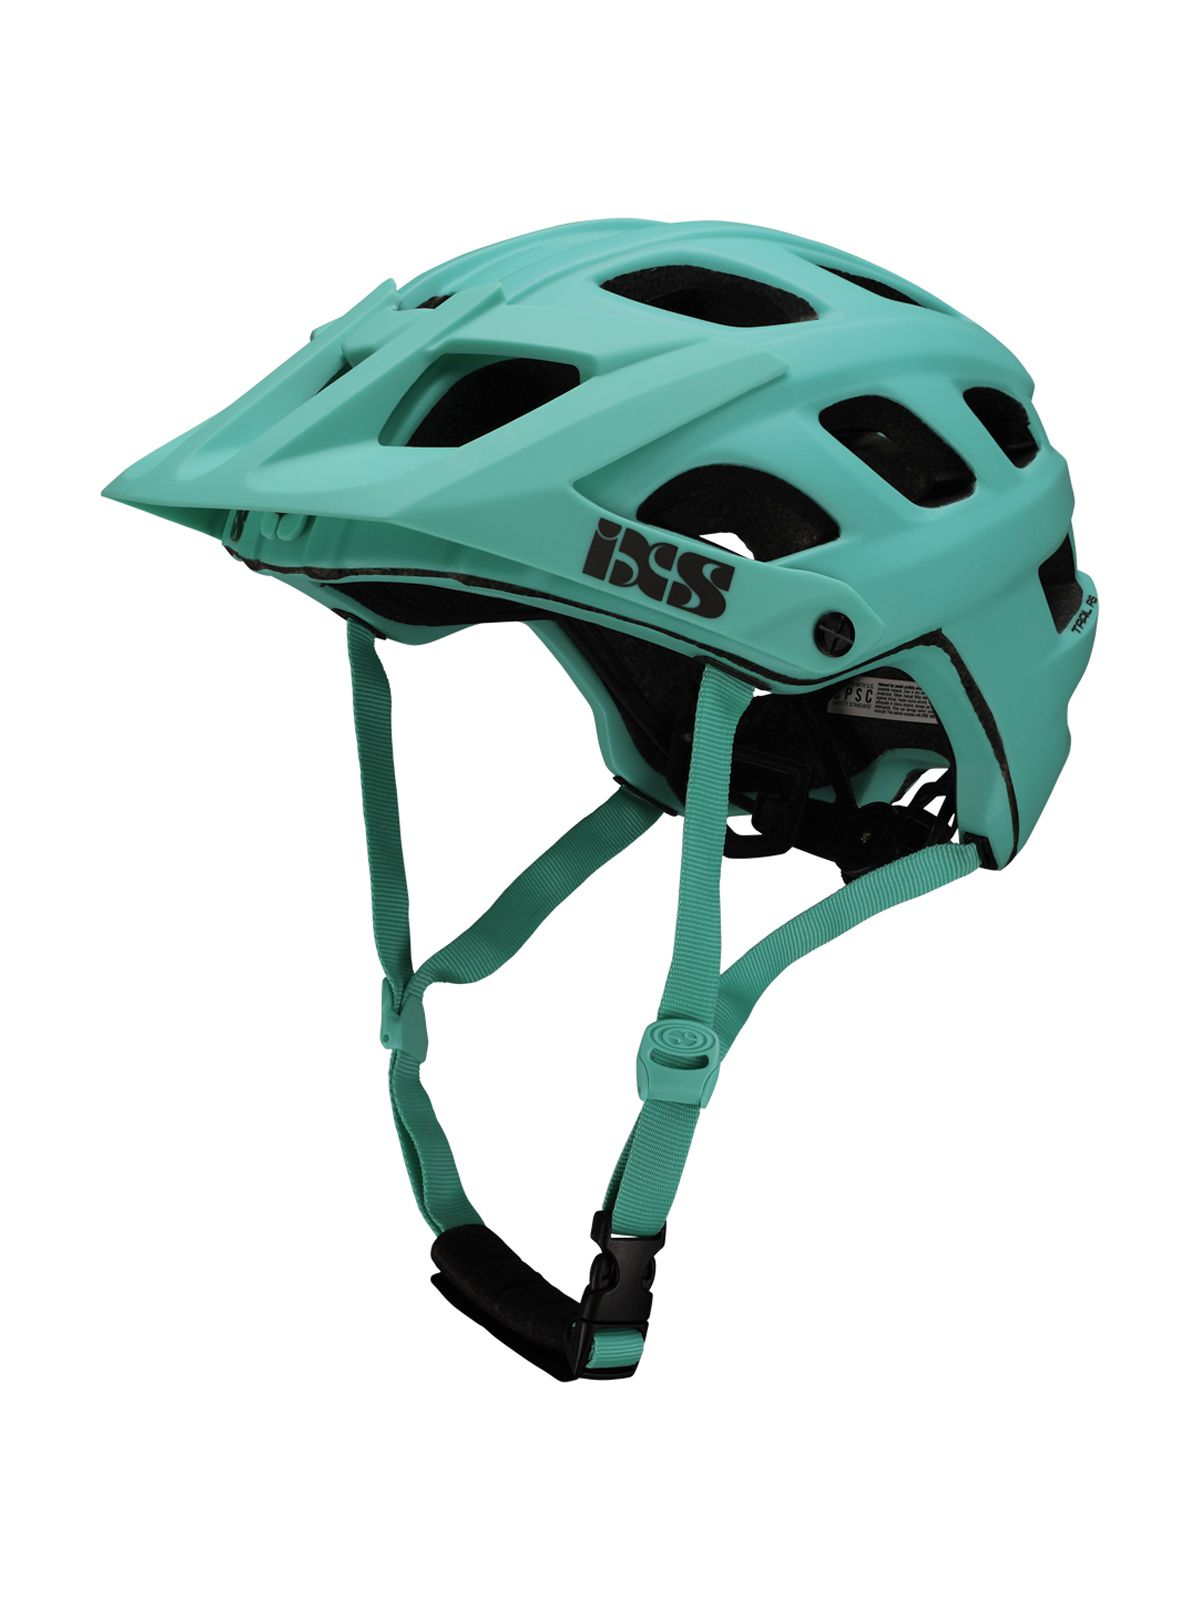 Ixs Trail Rs Evo All Mountain Bike Helmet Mtb